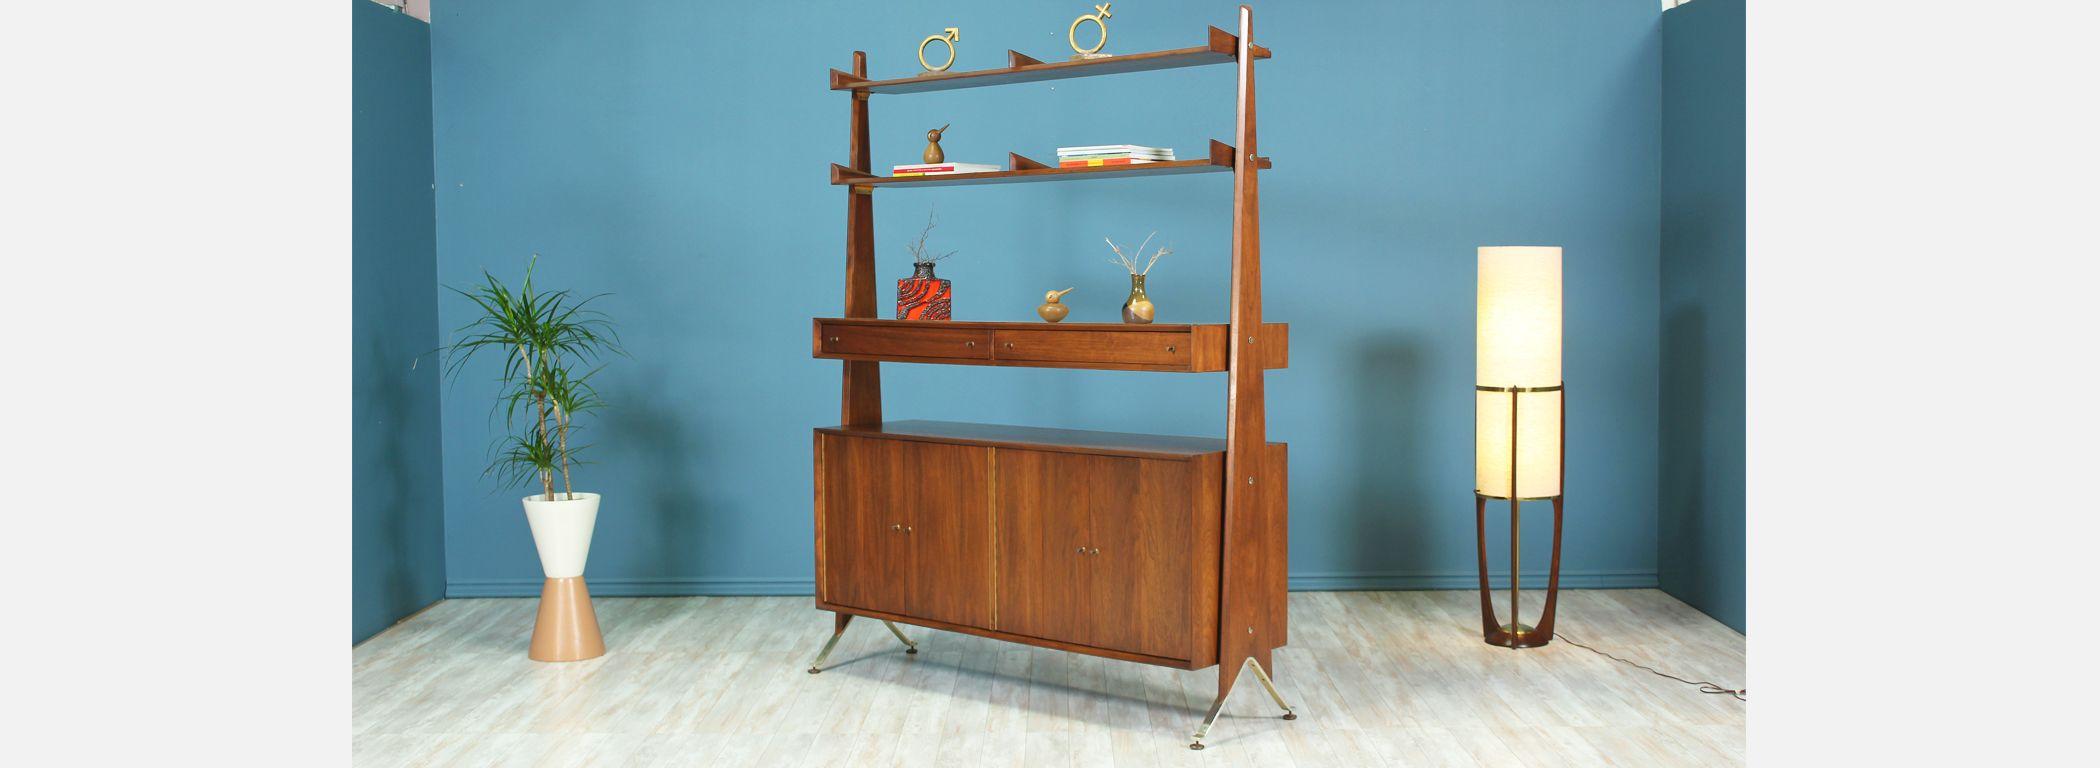 Swedish Modern Free-Standing Bookshelf Unit Image